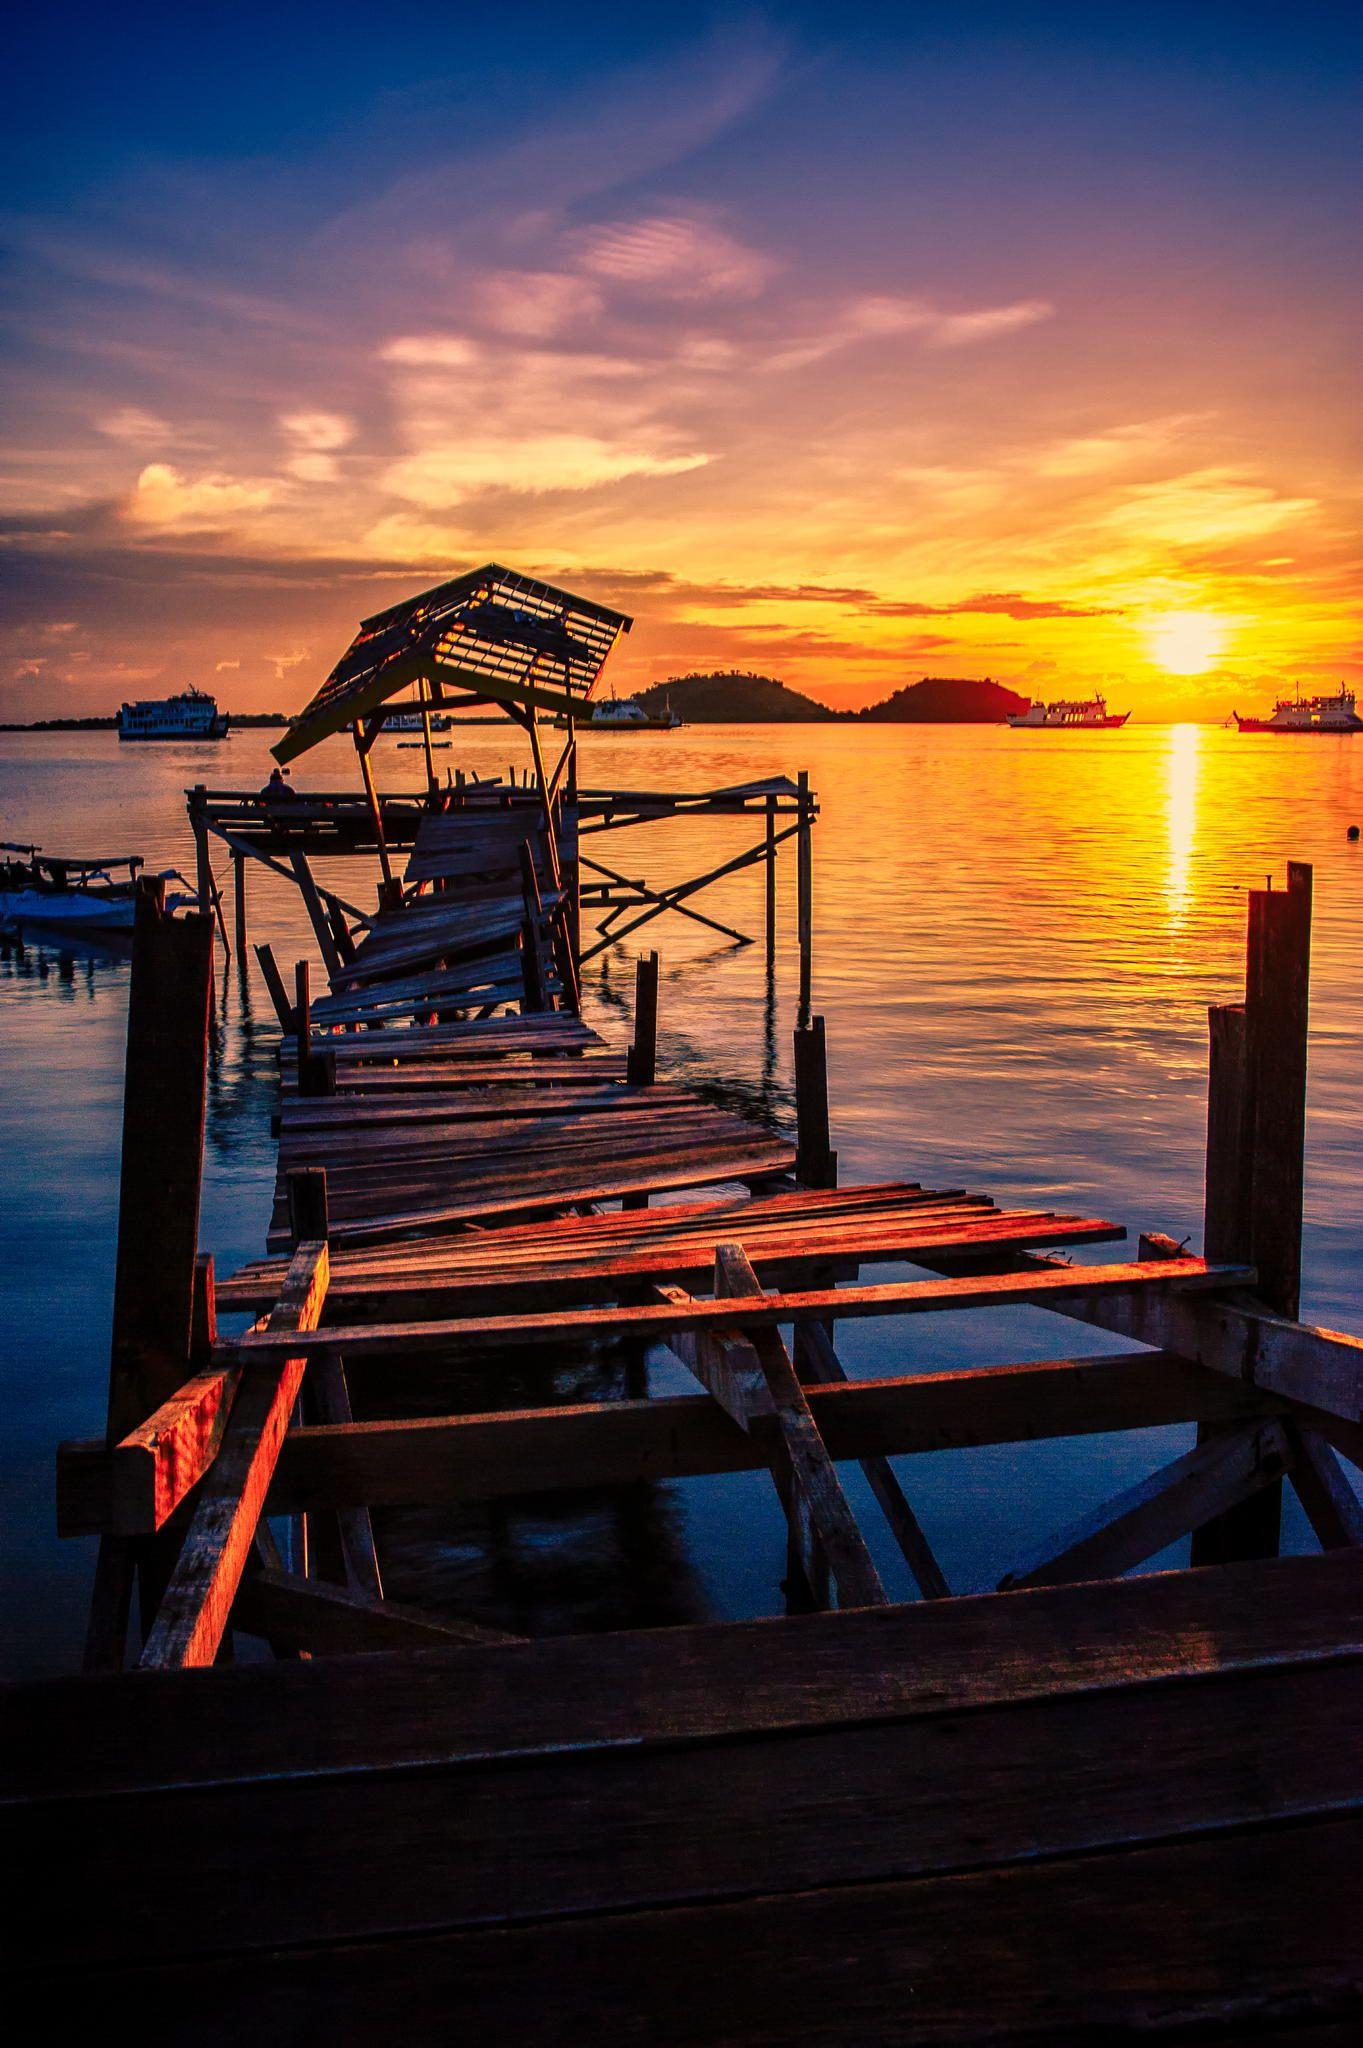 The Broken Pier - Poto Tano, West Sumbawa, Indonesia